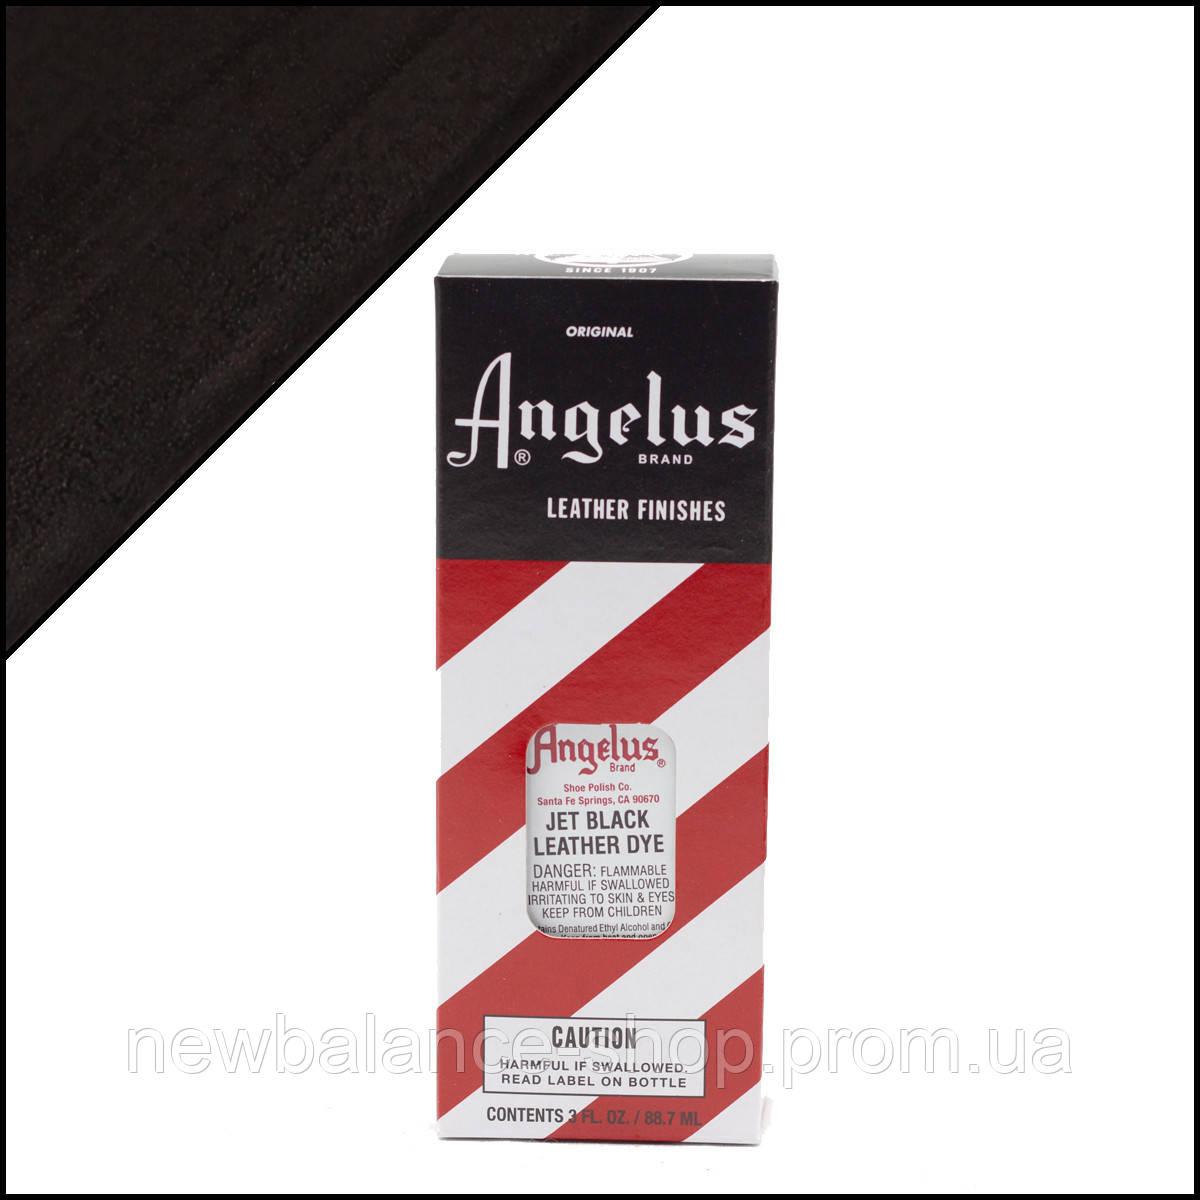 419761faab2c Краситель для кожи Angelus Leather Dye Jet Black (черная) - NEW BALANCE shop  в